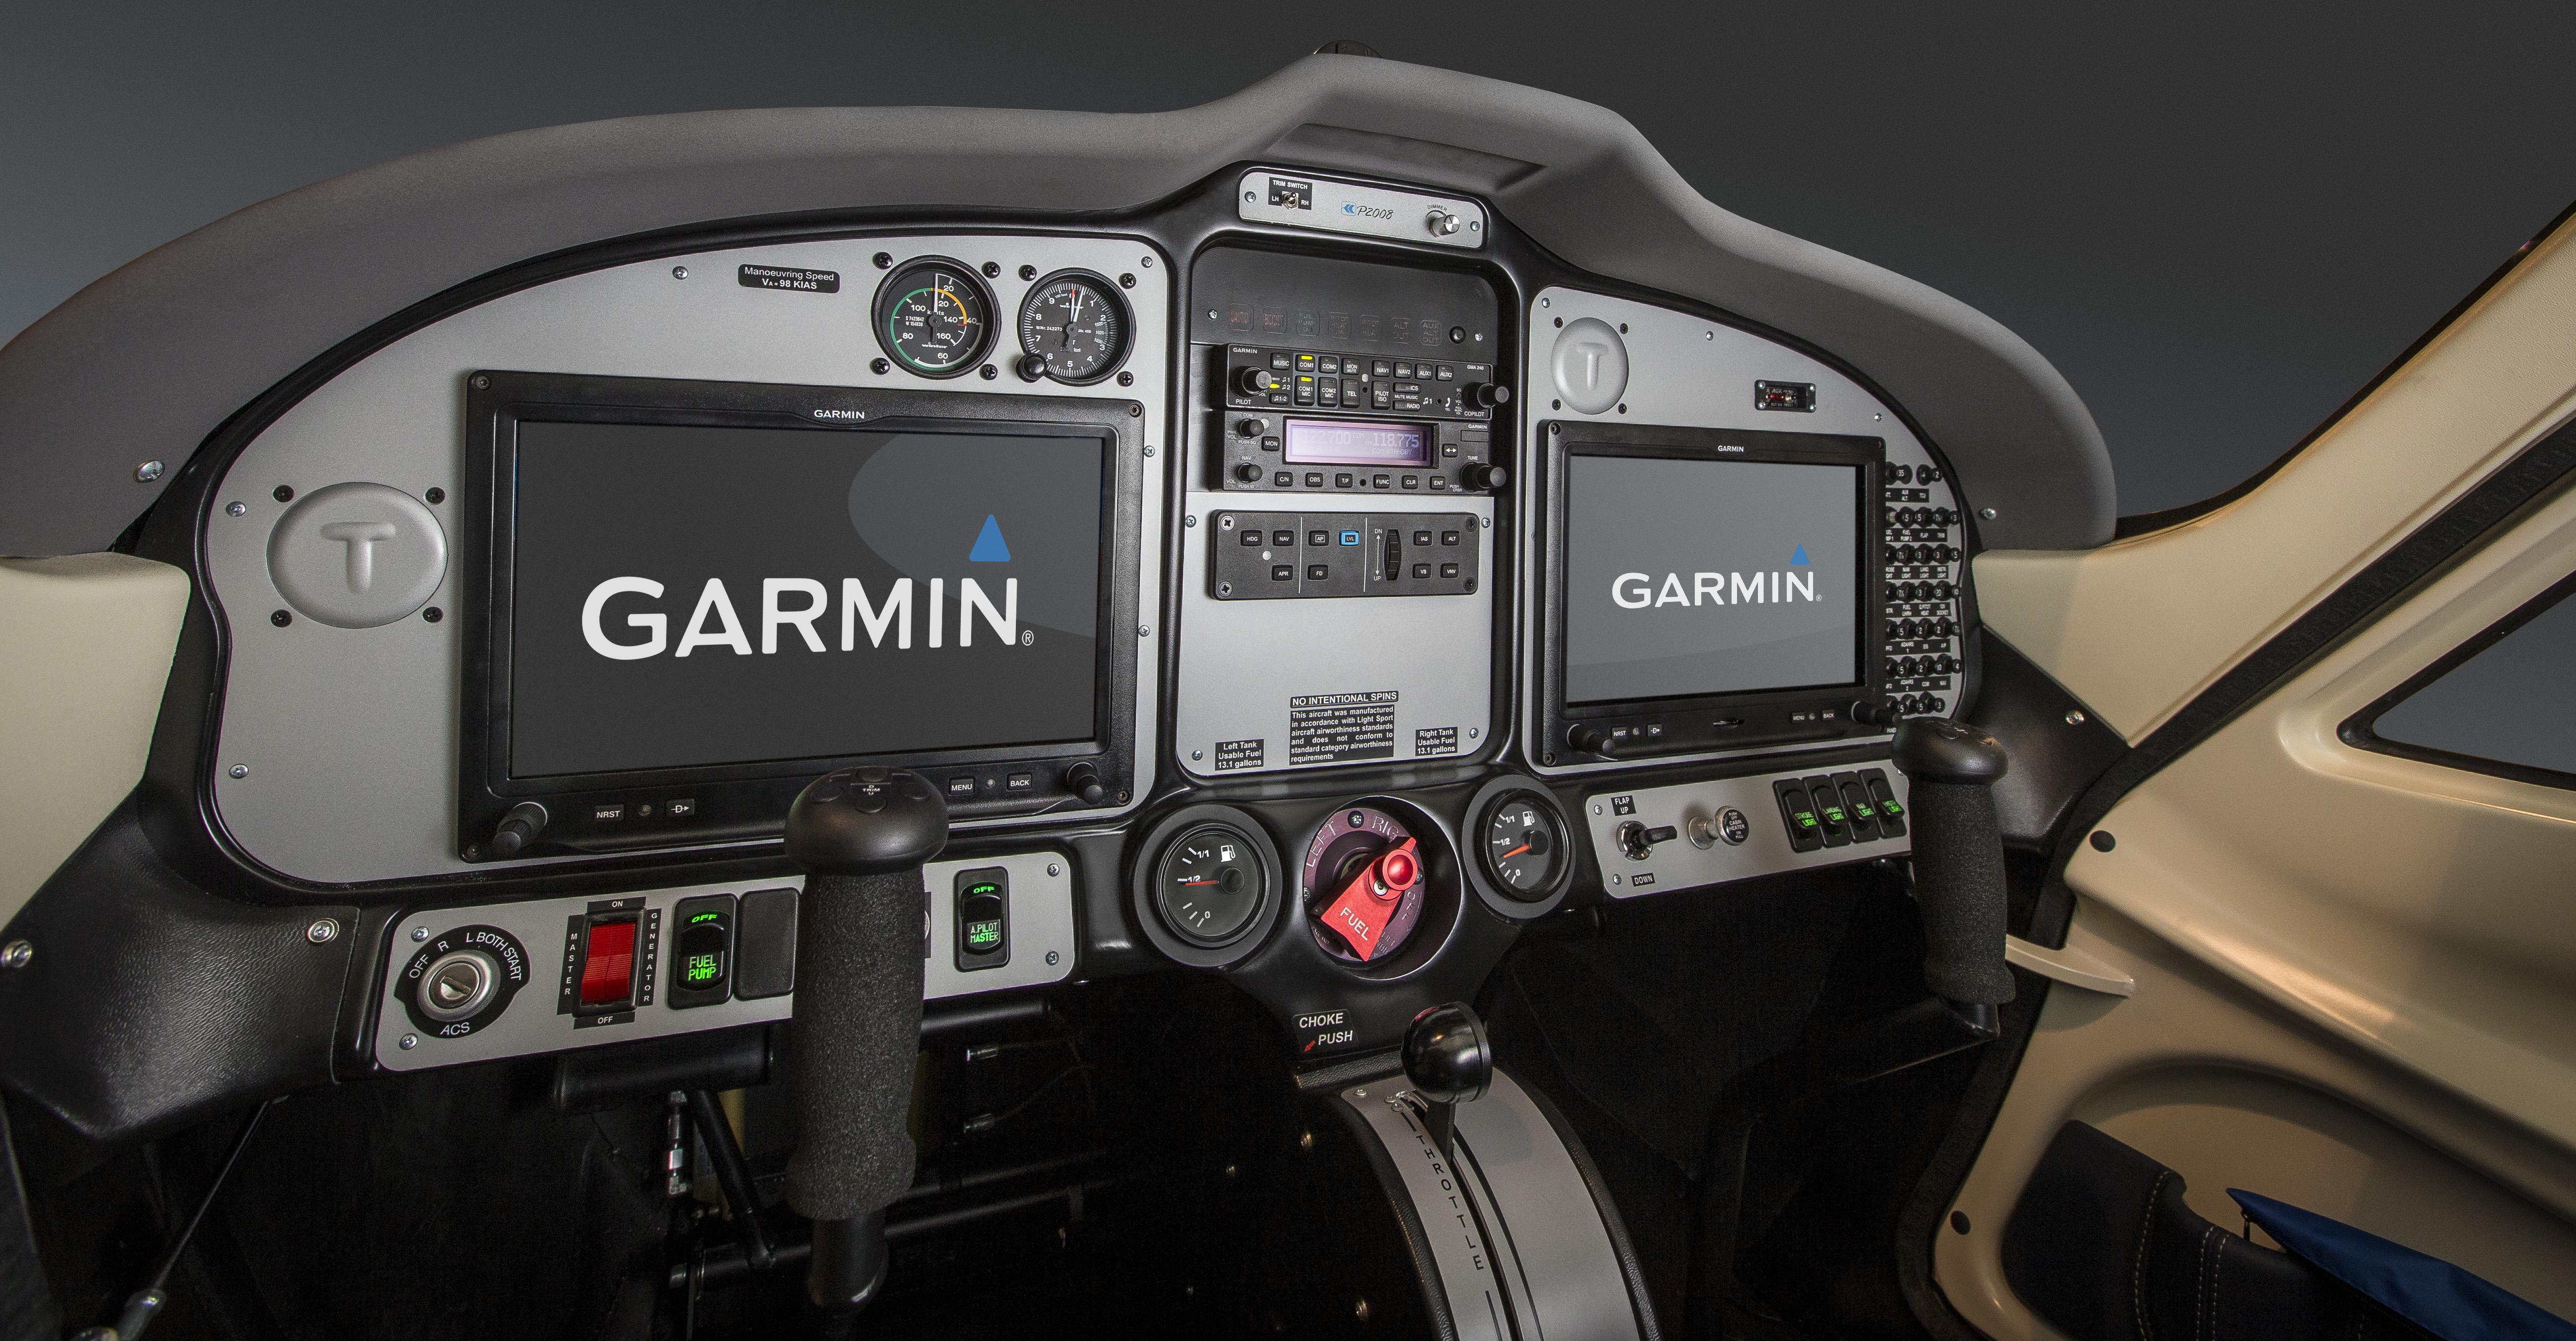 Garmin-P2008US-lsa